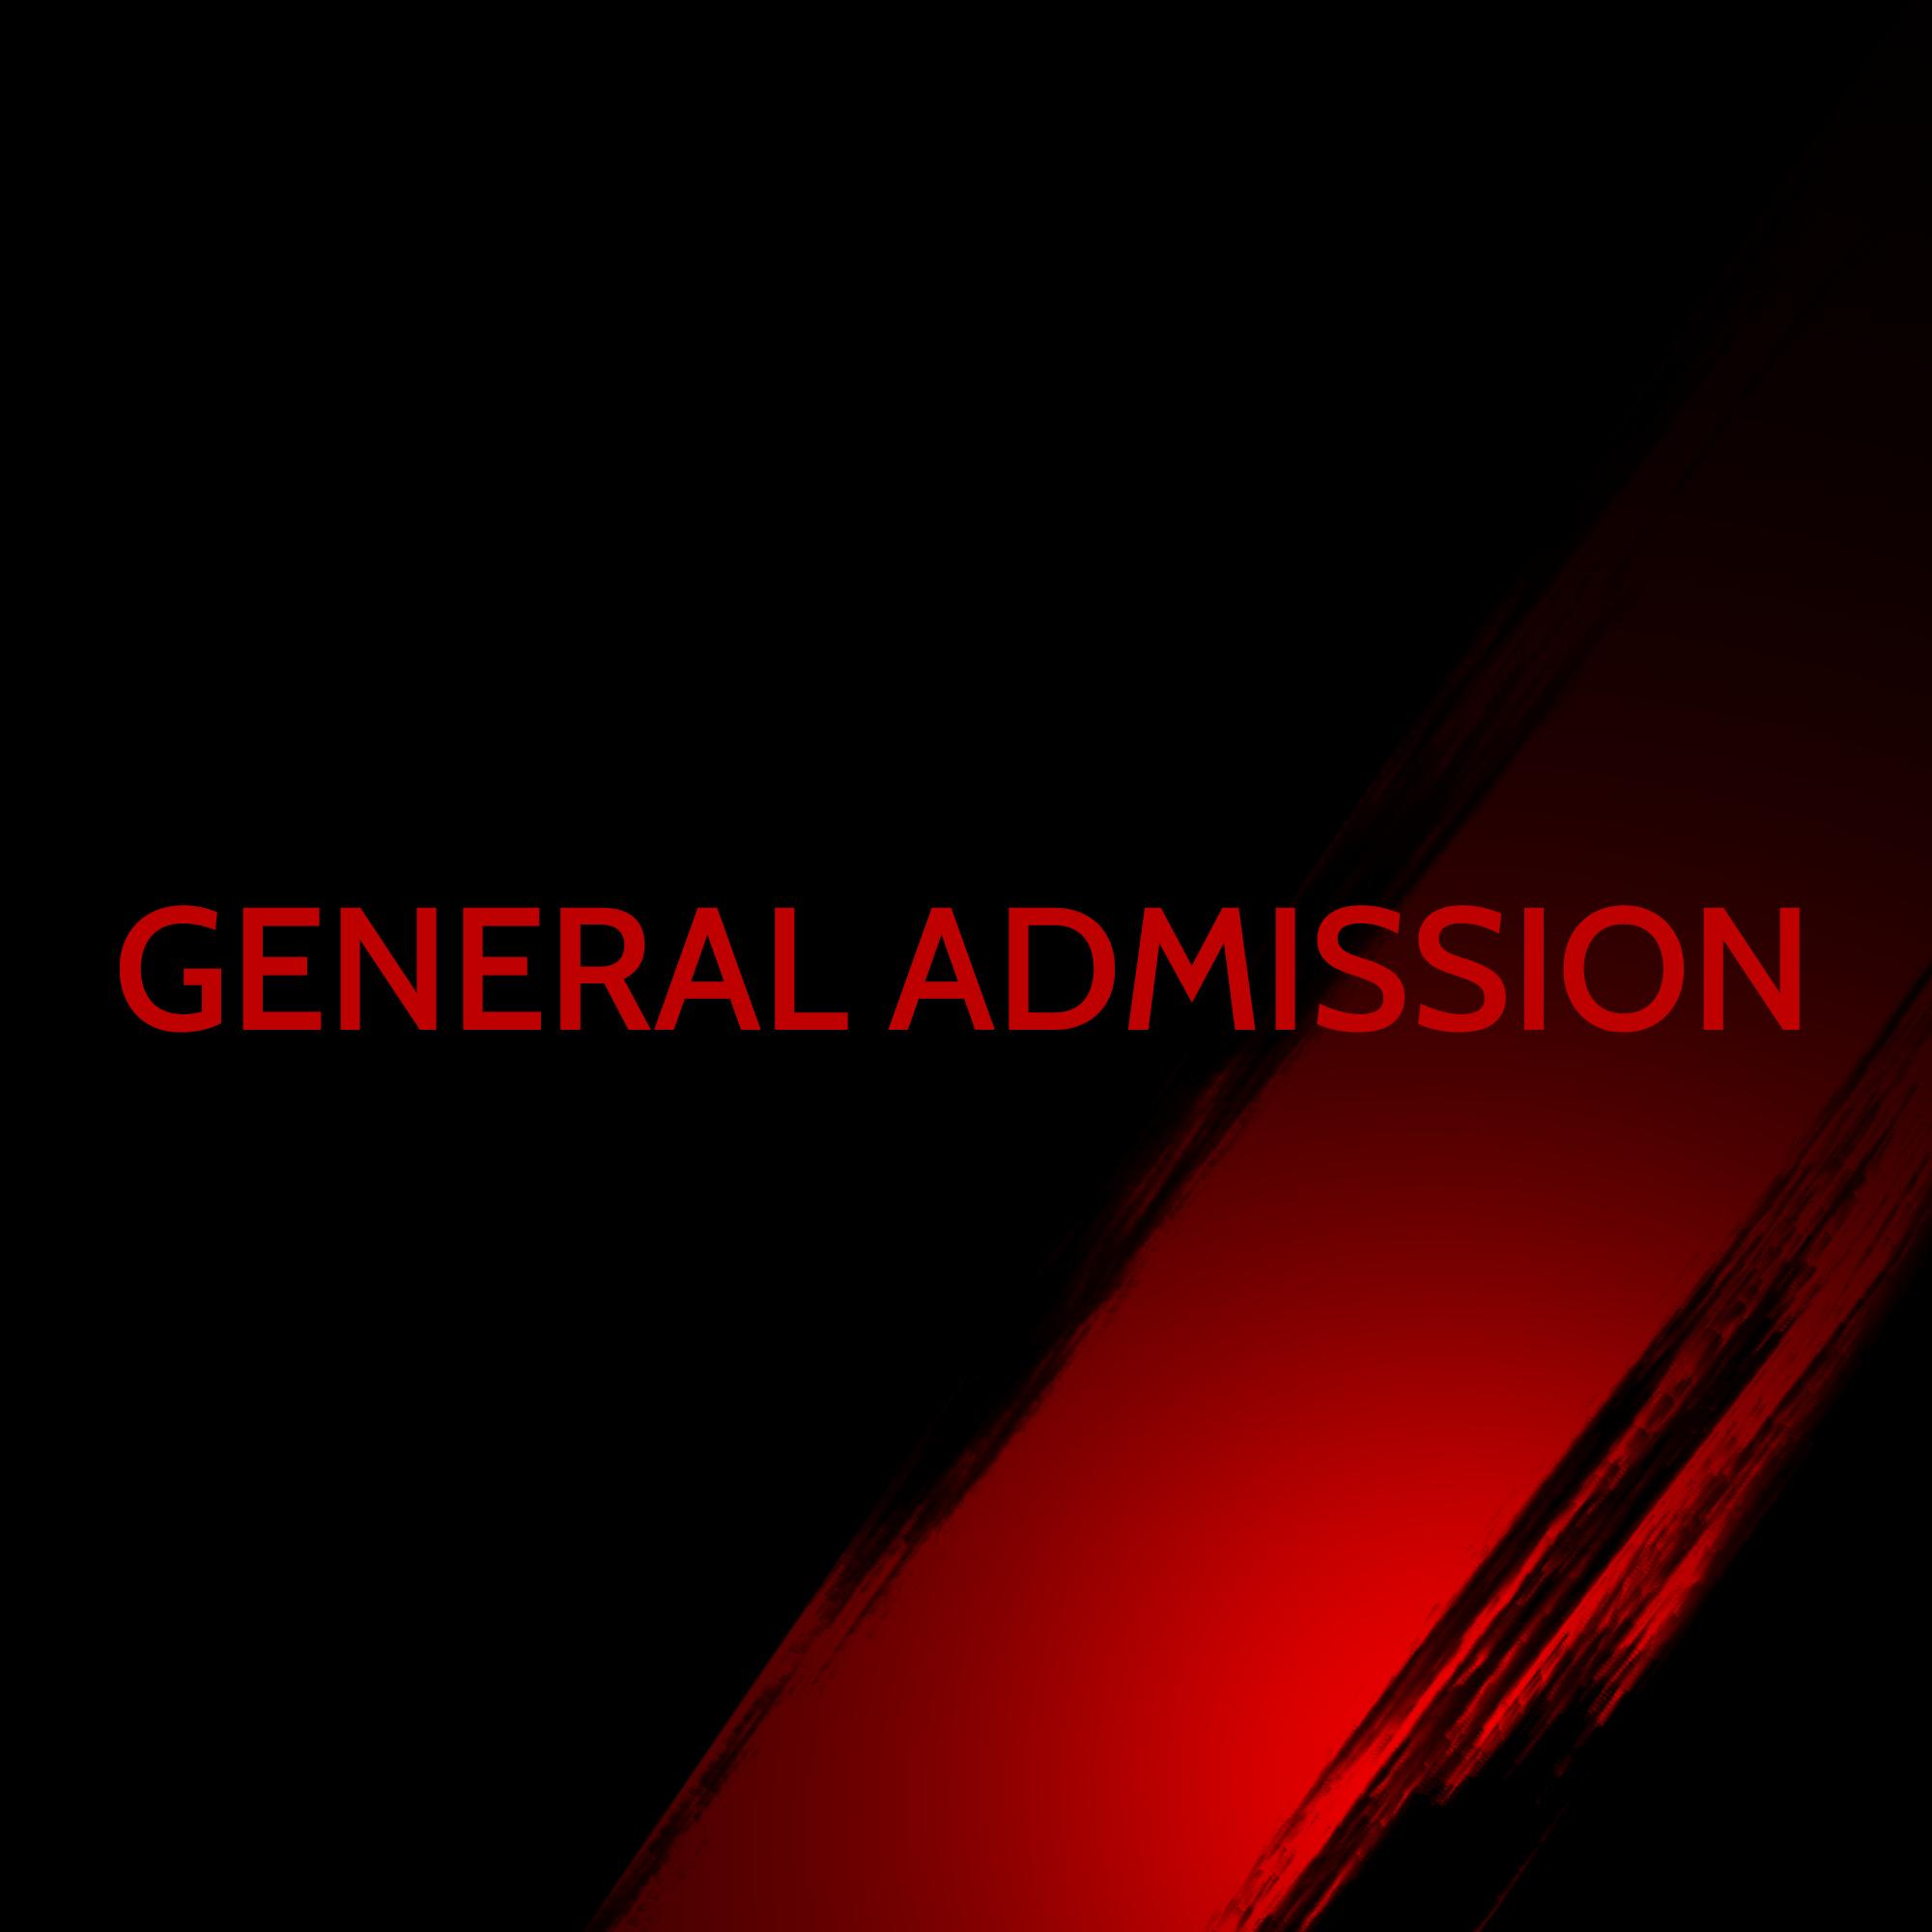 General Admission TAB-003